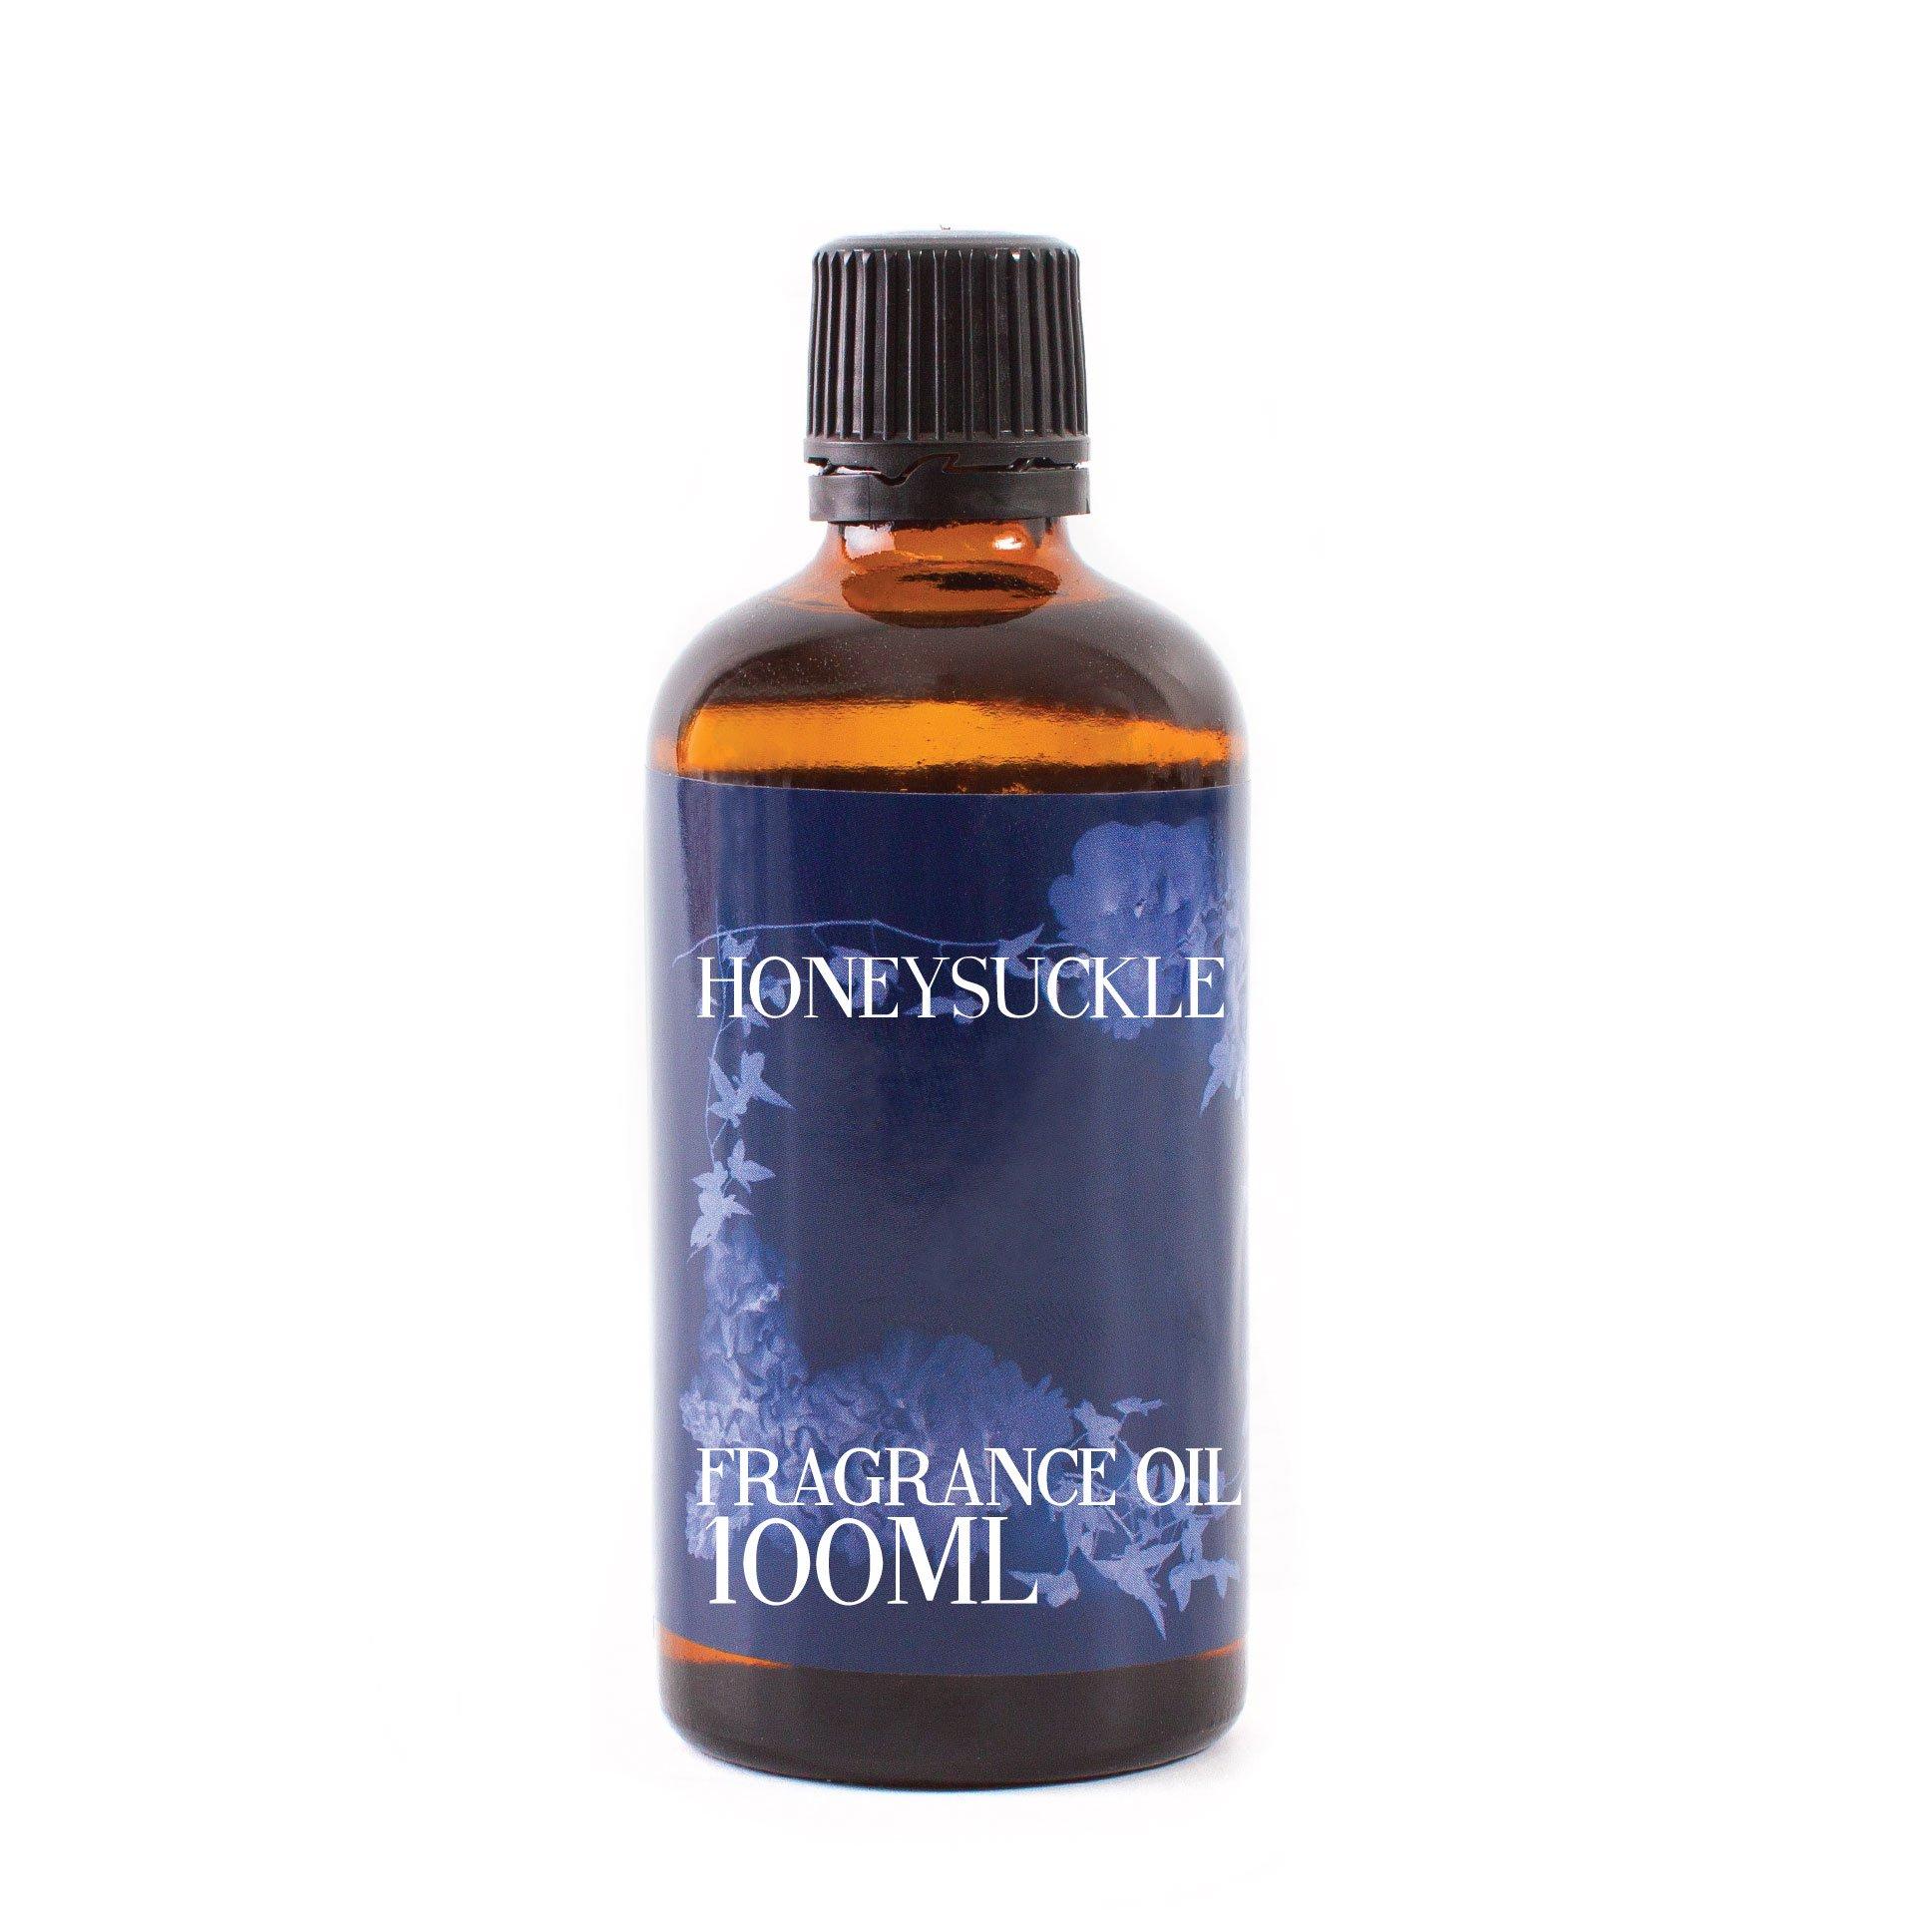 Mystic Moments | Honeysuckle Fragrance Oil - 100ml